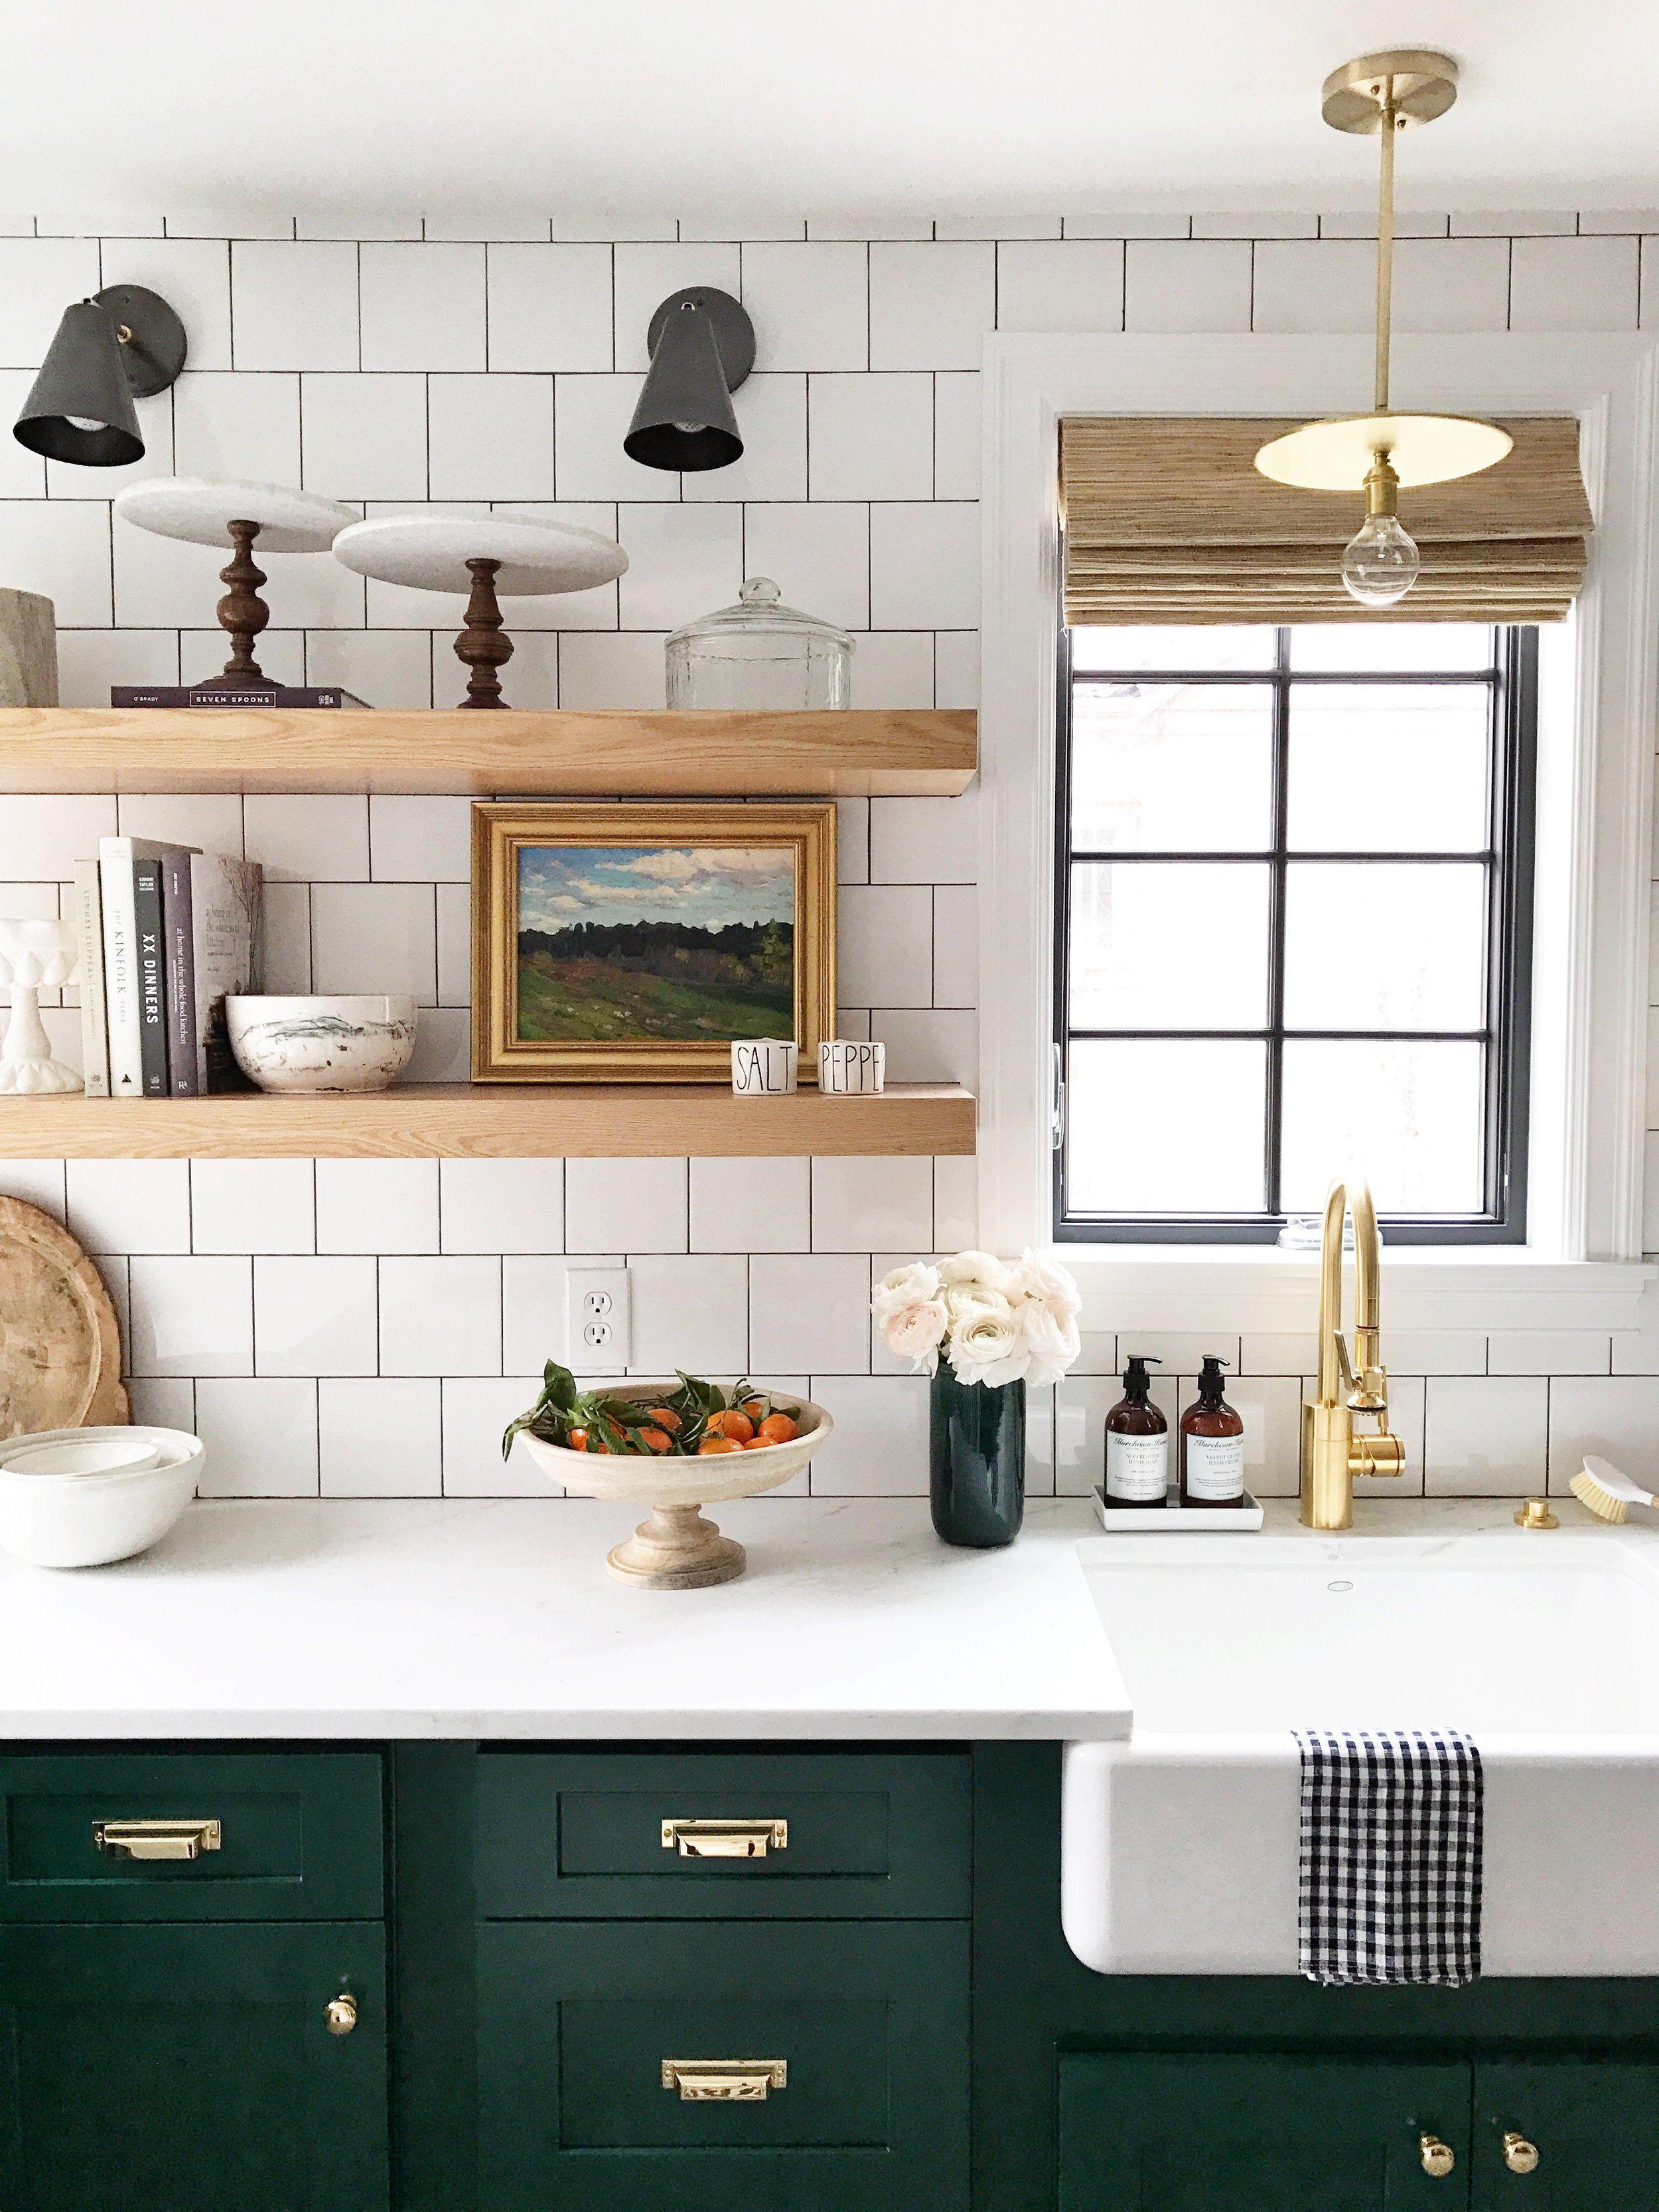 The Sunday 7   Studio mcgee, Green kitchen and Hardware